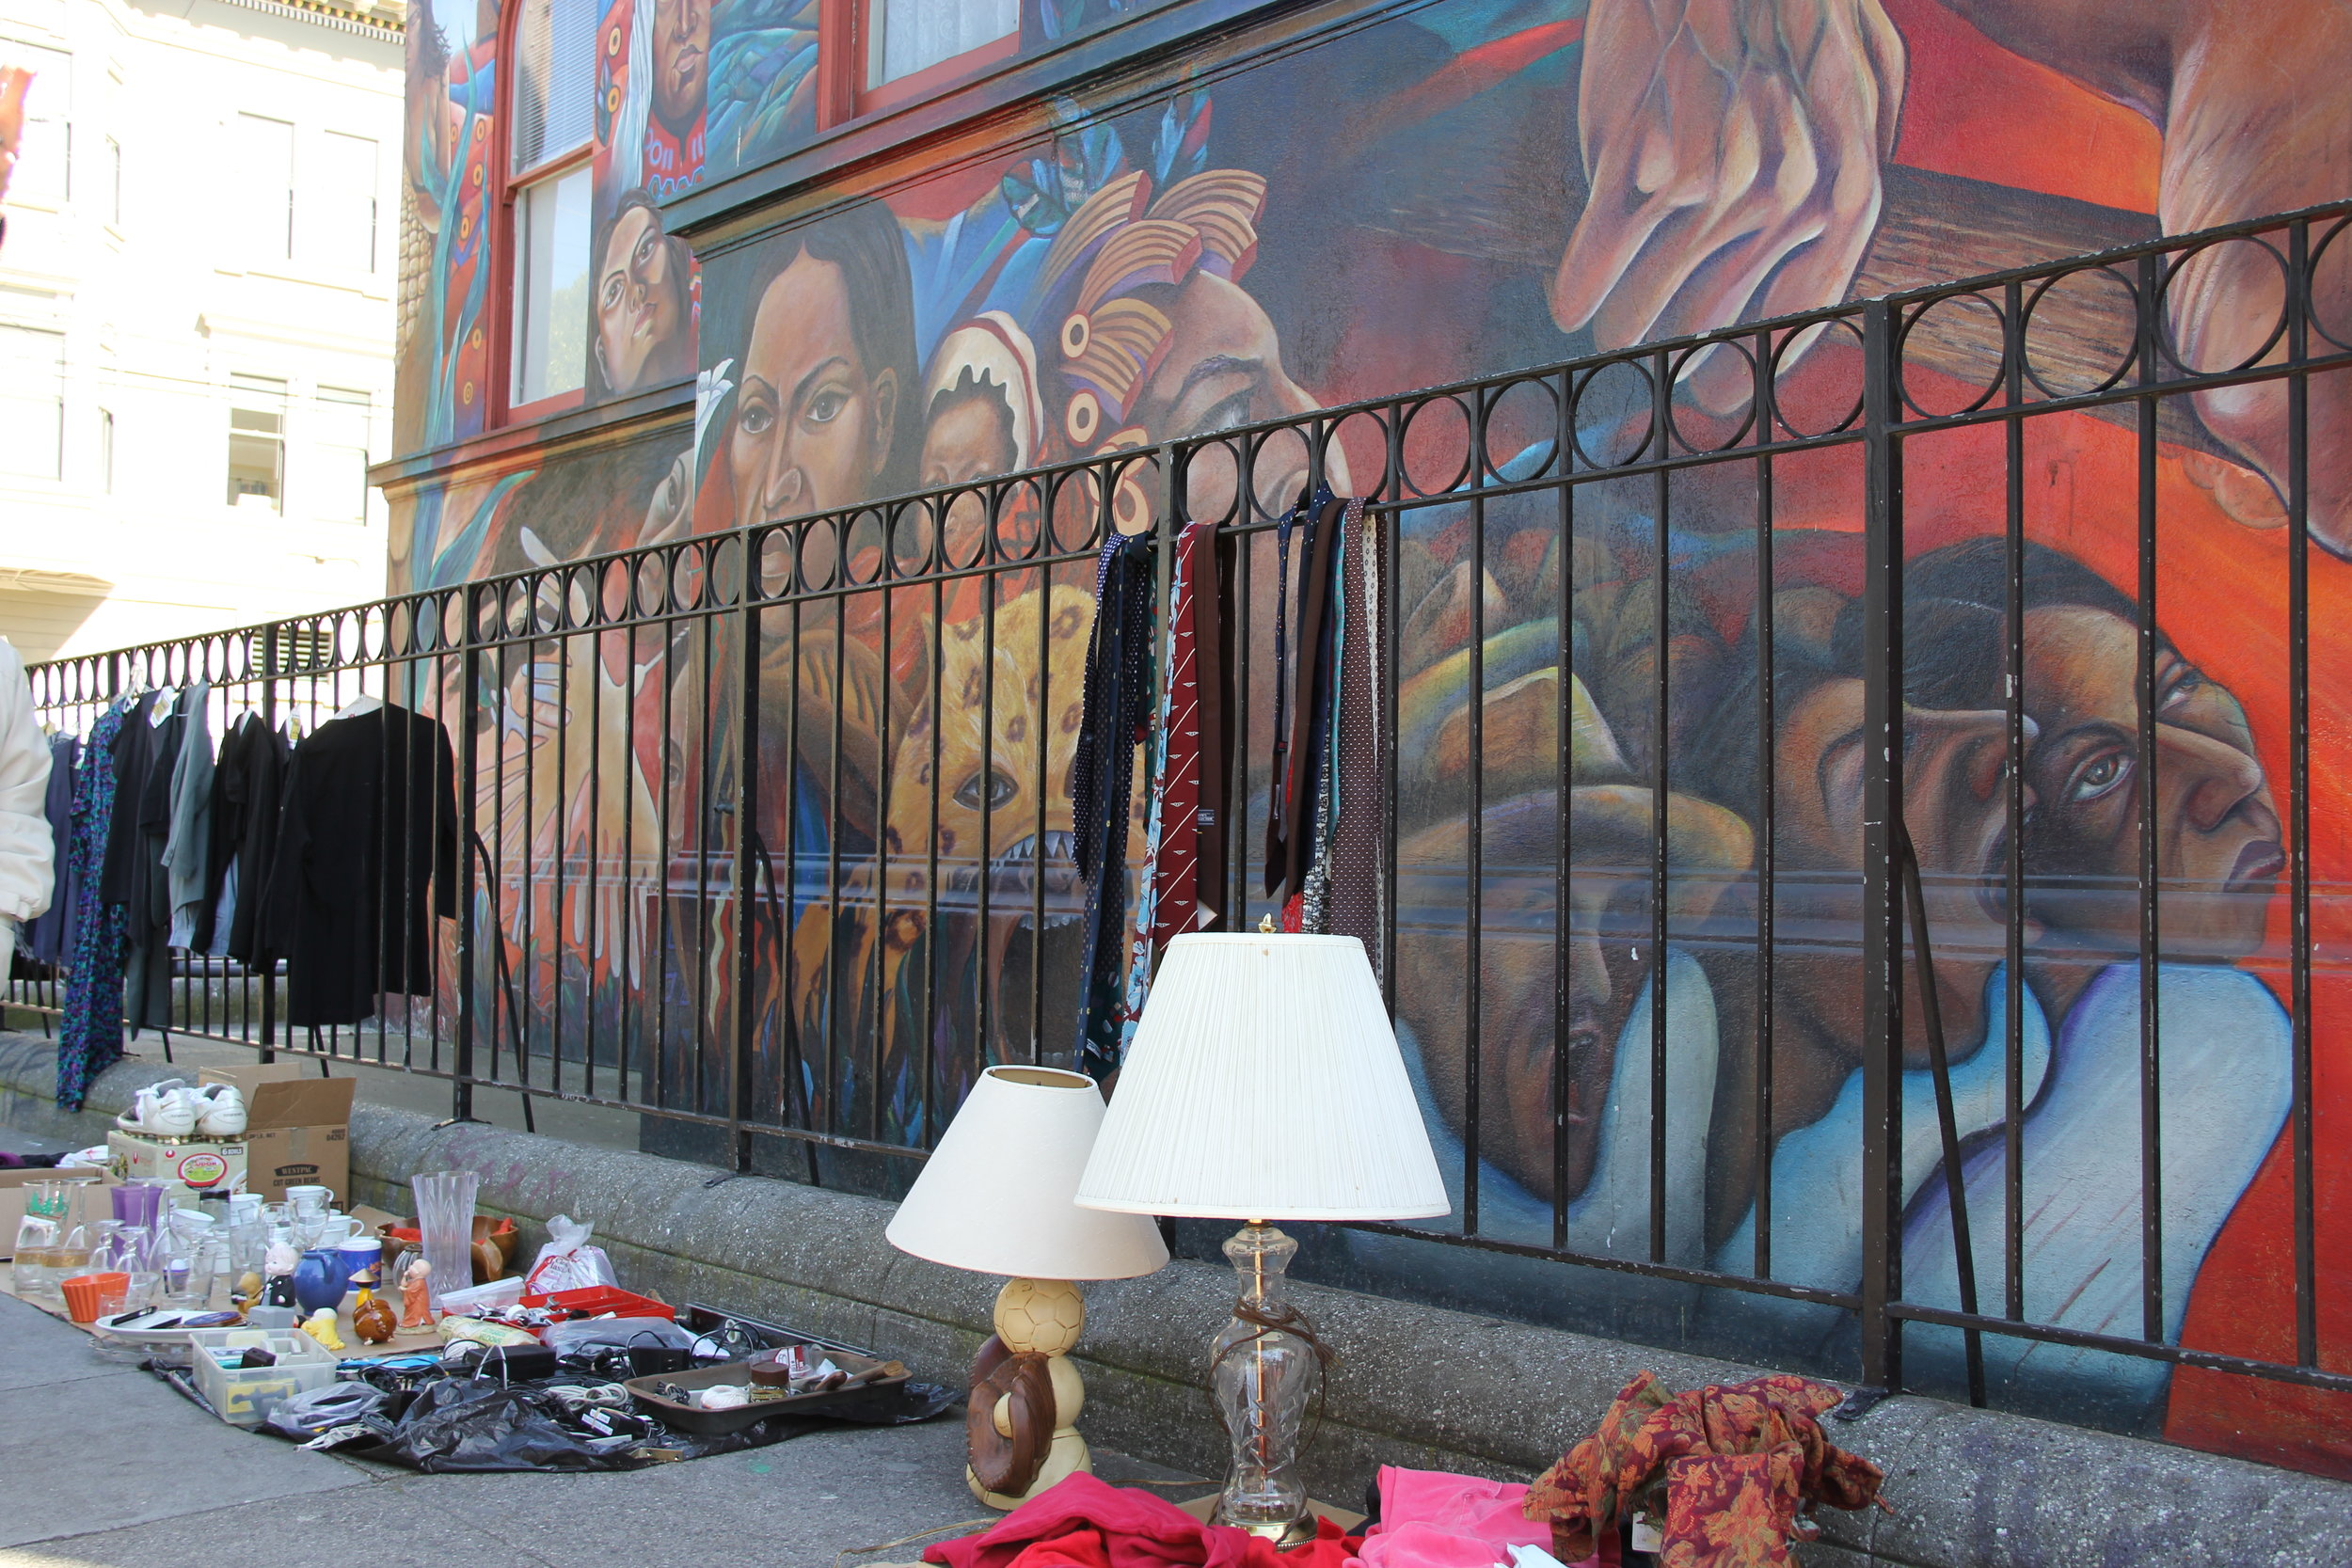 24th St. in San Francisco. Photo: Lara Manzanares